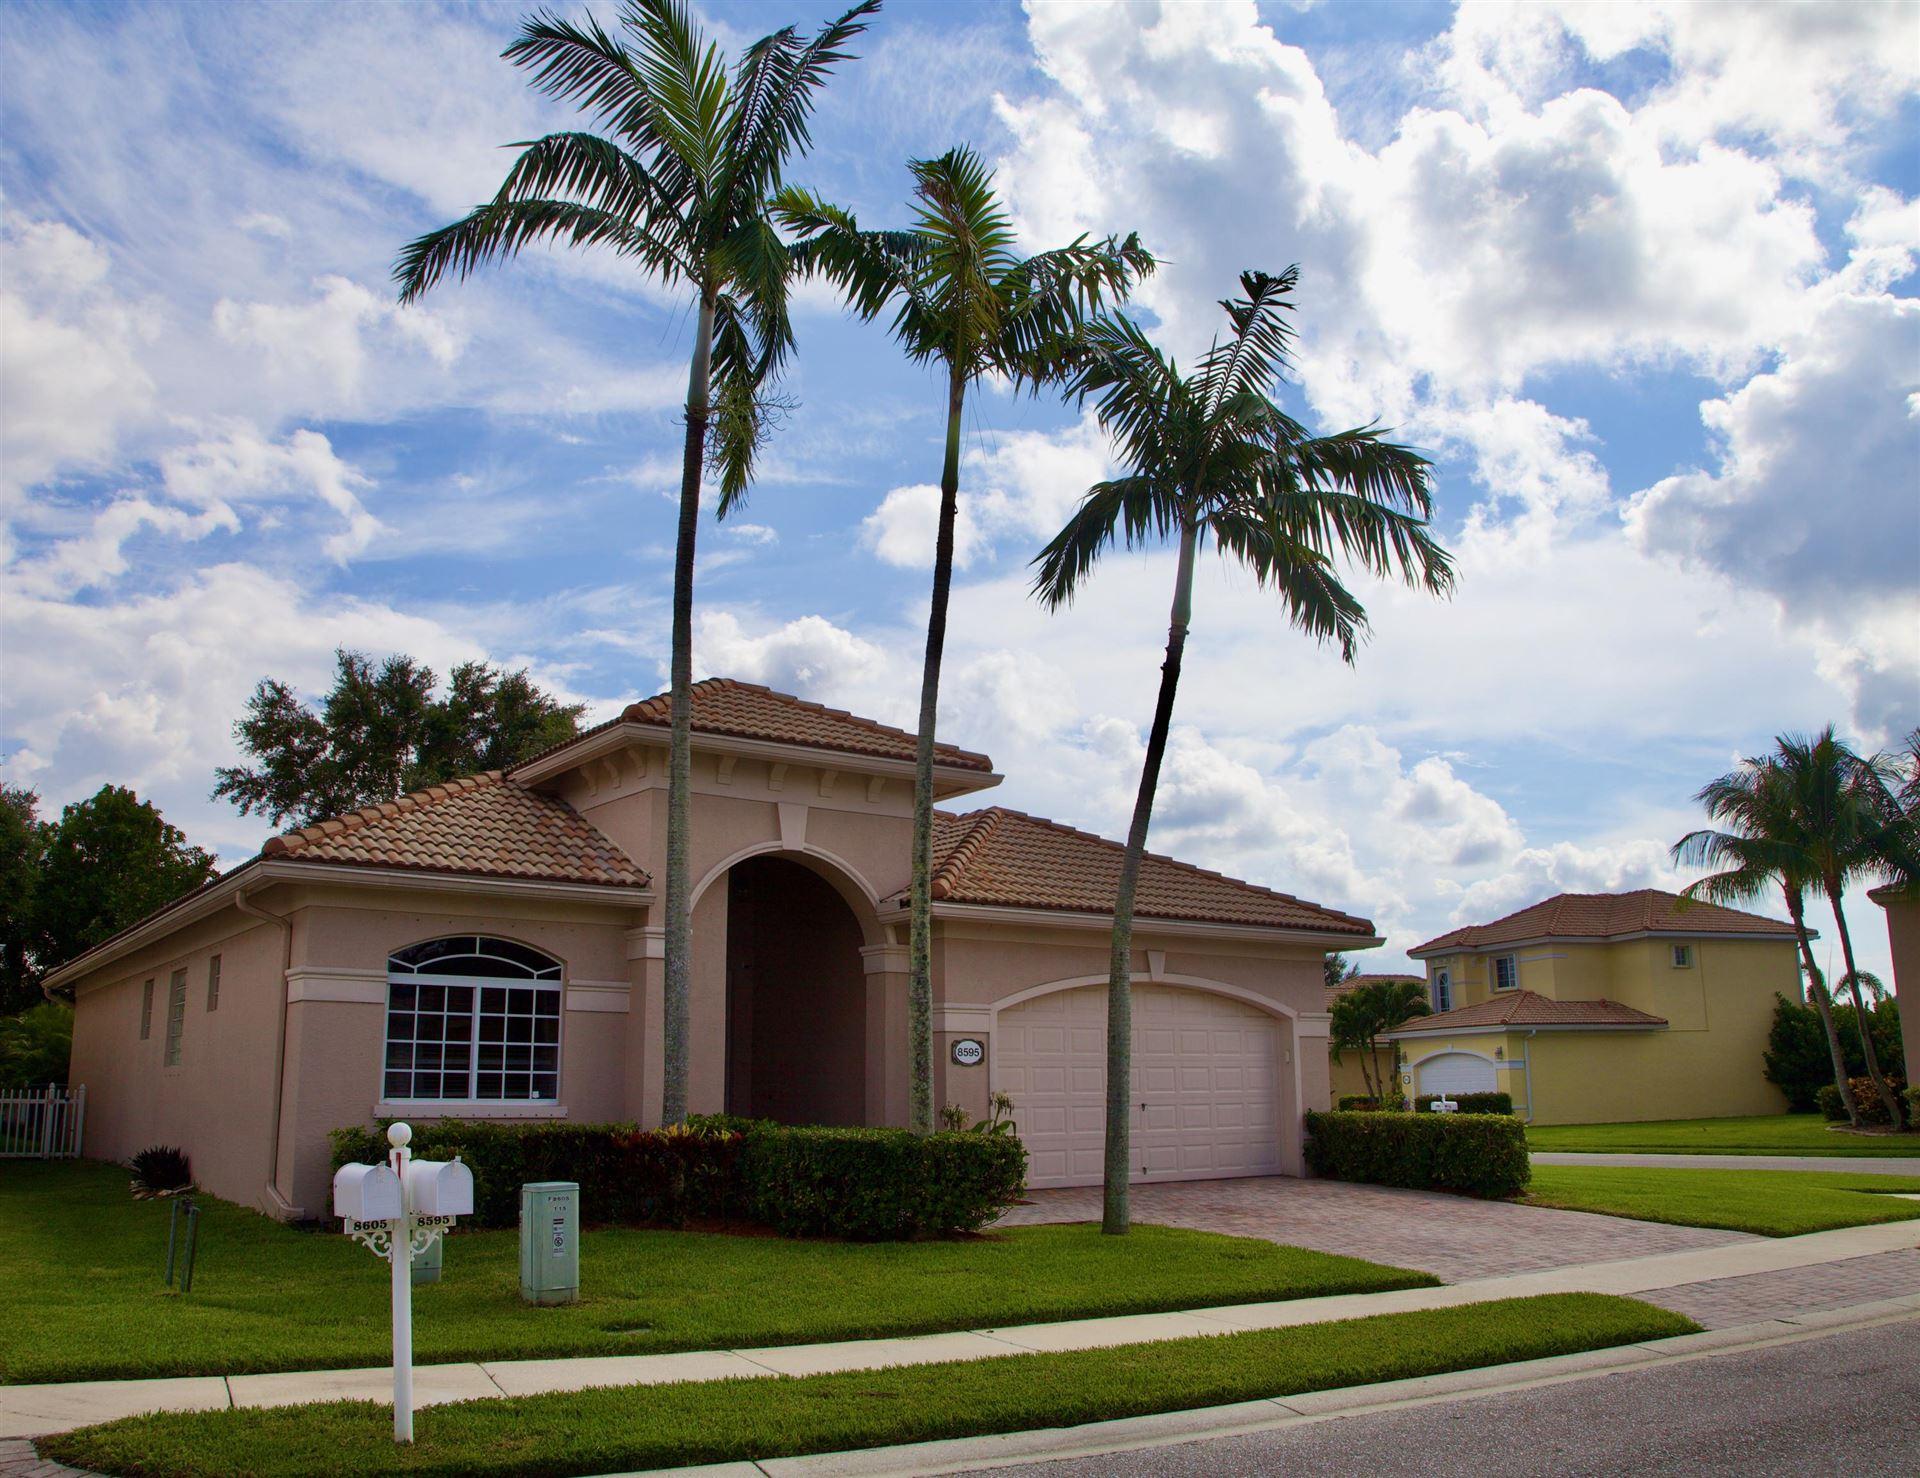 8595 Plum Cay, West Palm Beach, FL 33411 - #: RX-10638727